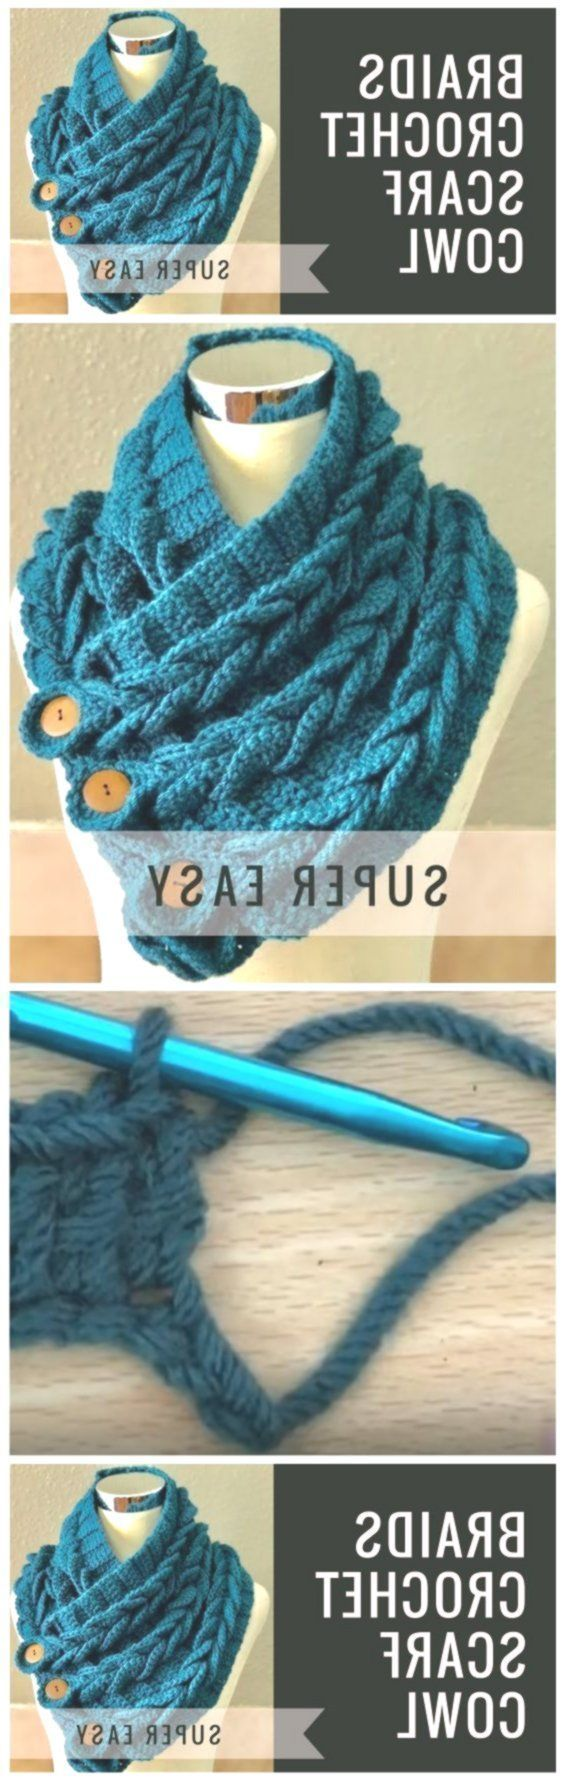 Photo of Häkelschal für Anfänger # Stricken #Bordado # Häkeln #Amigurumi #Embroidery,…